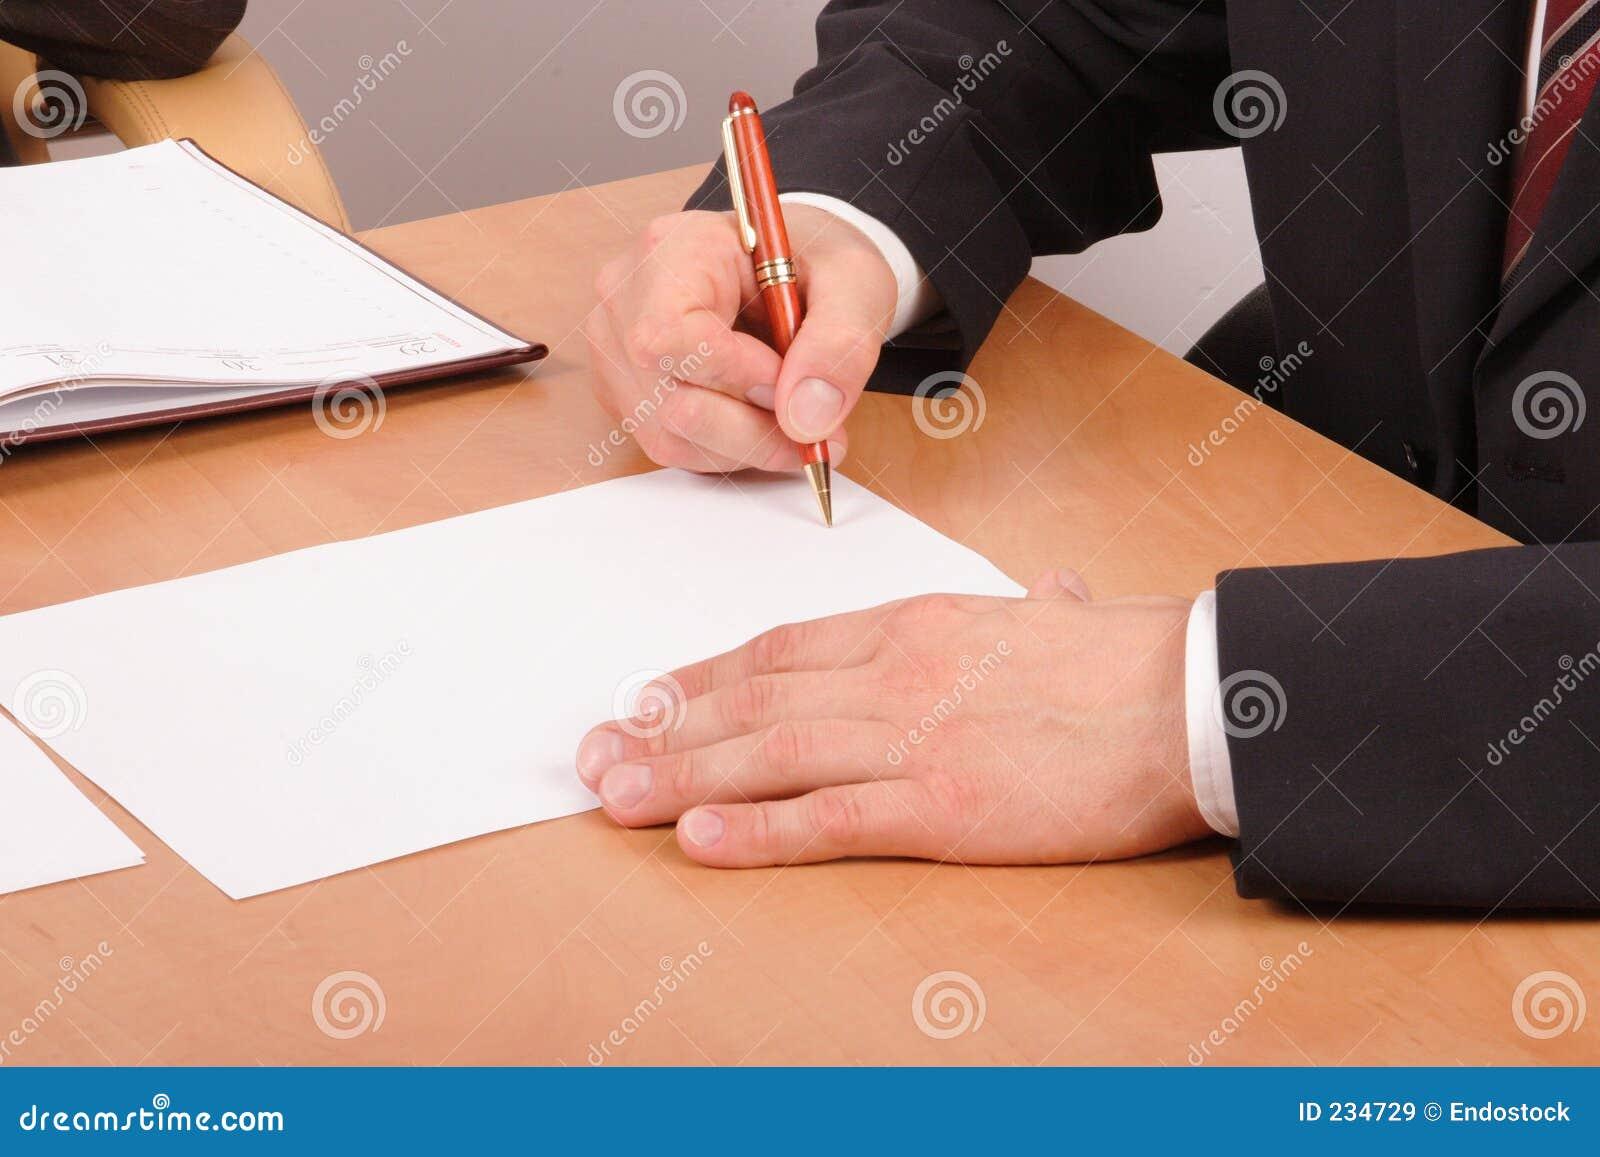 Zakenman die documenten ondertekent - 2